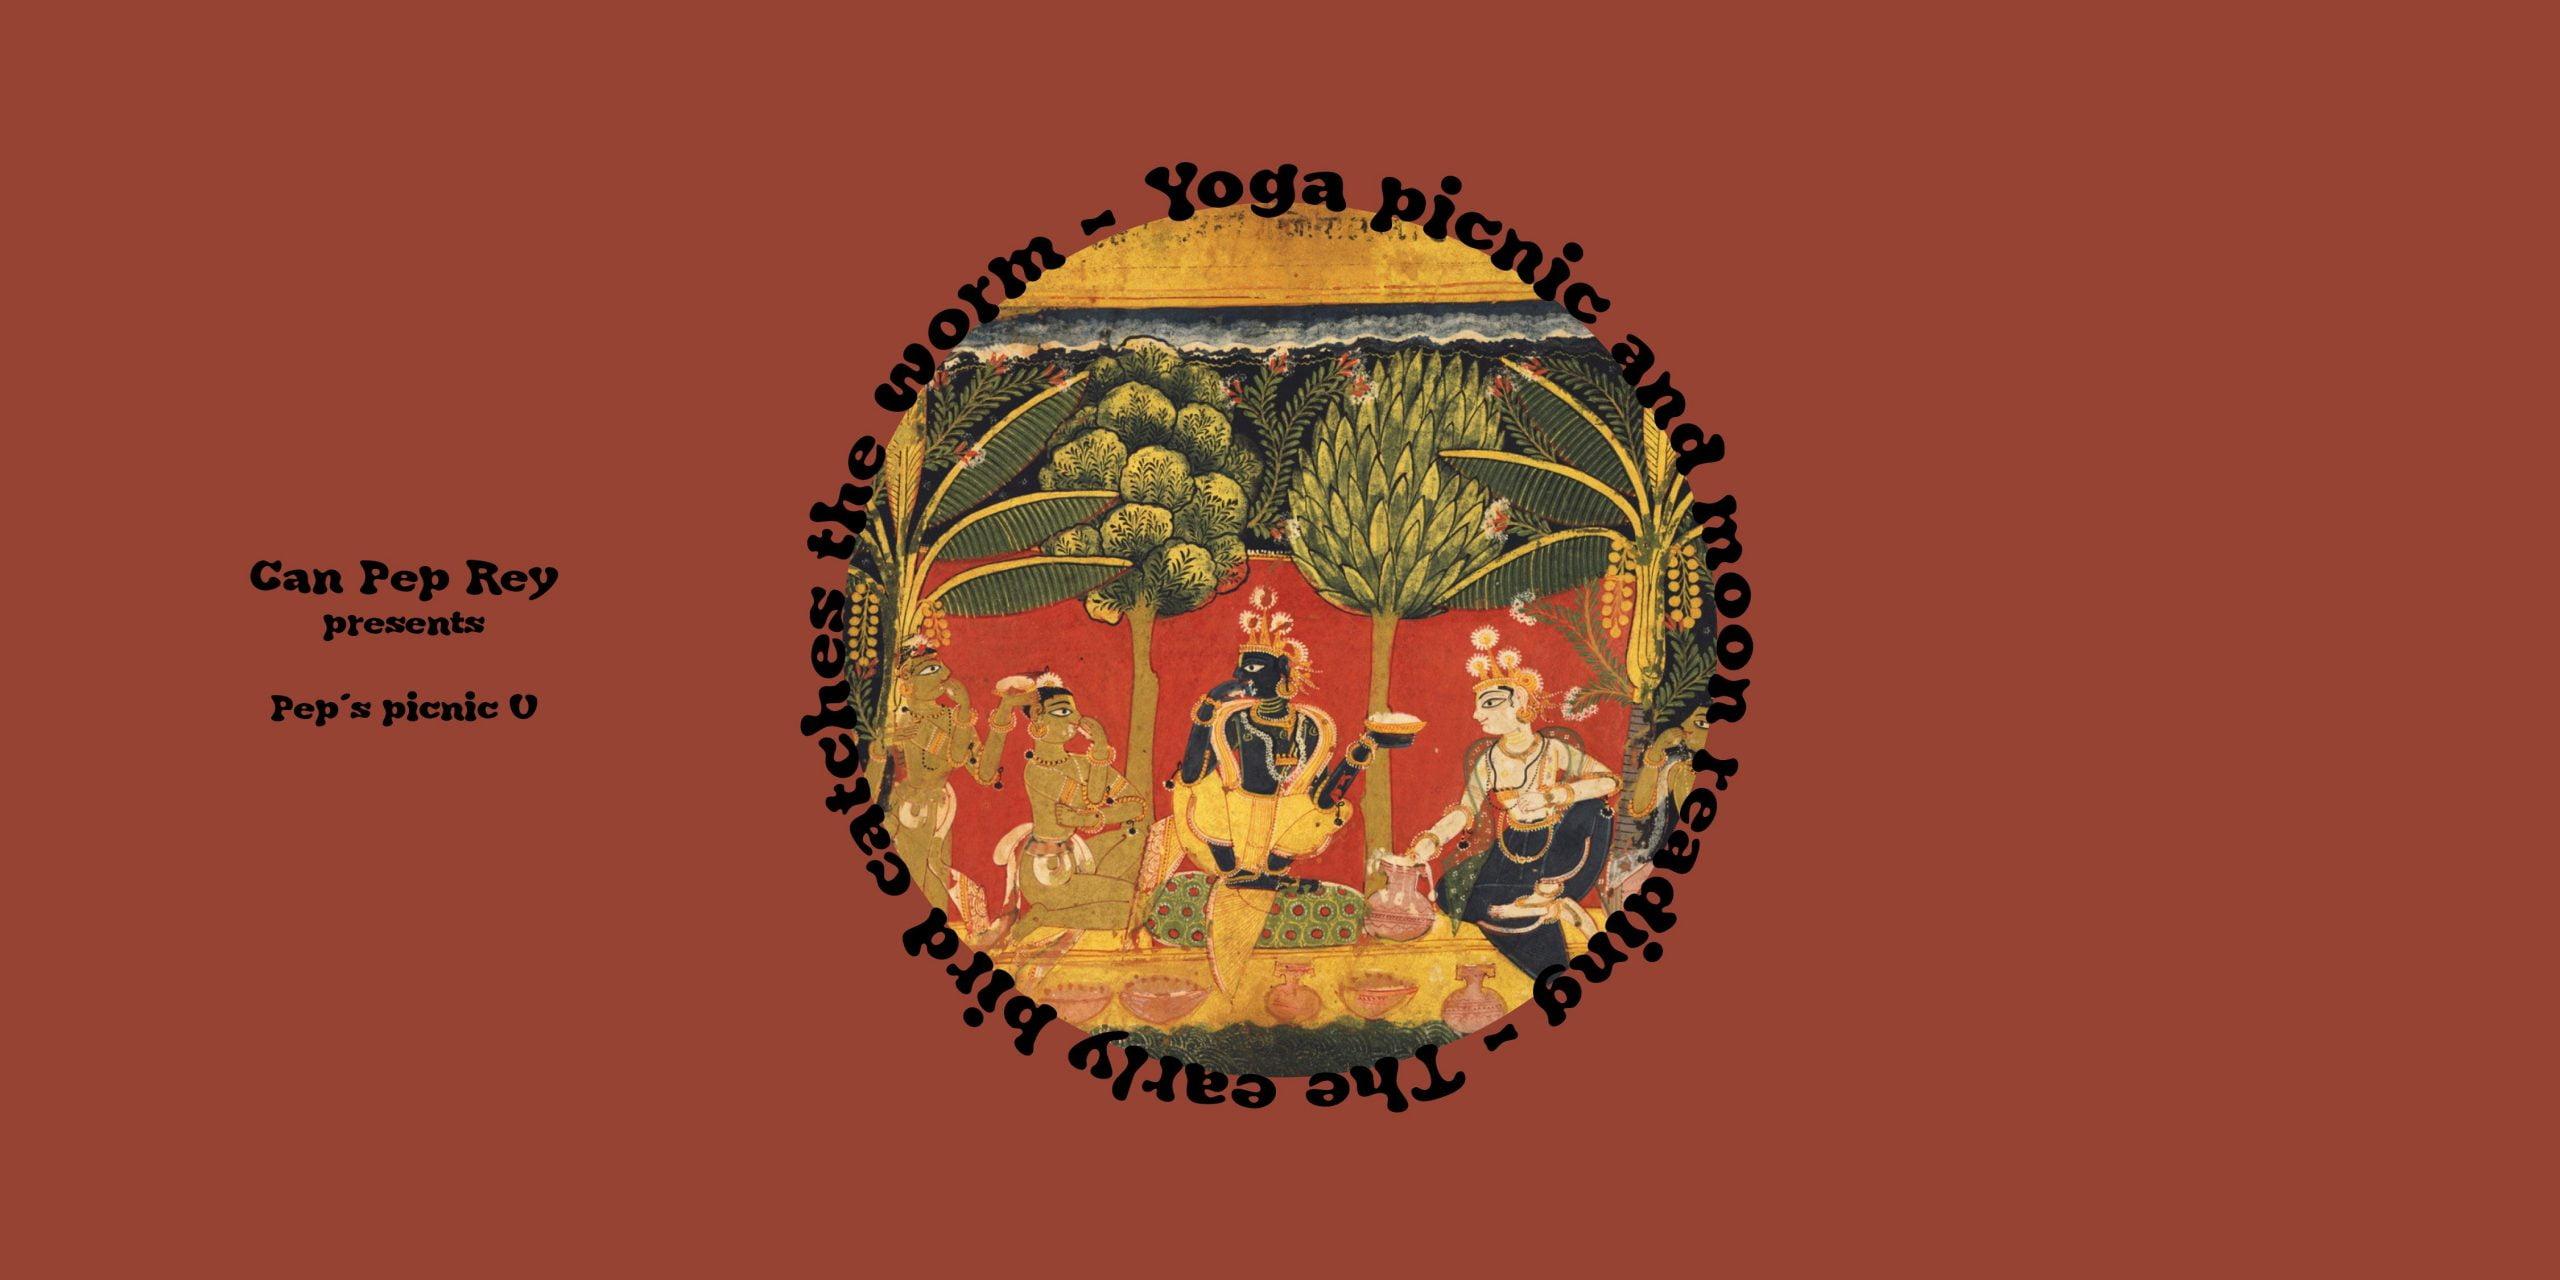 Yoga Picnic 1